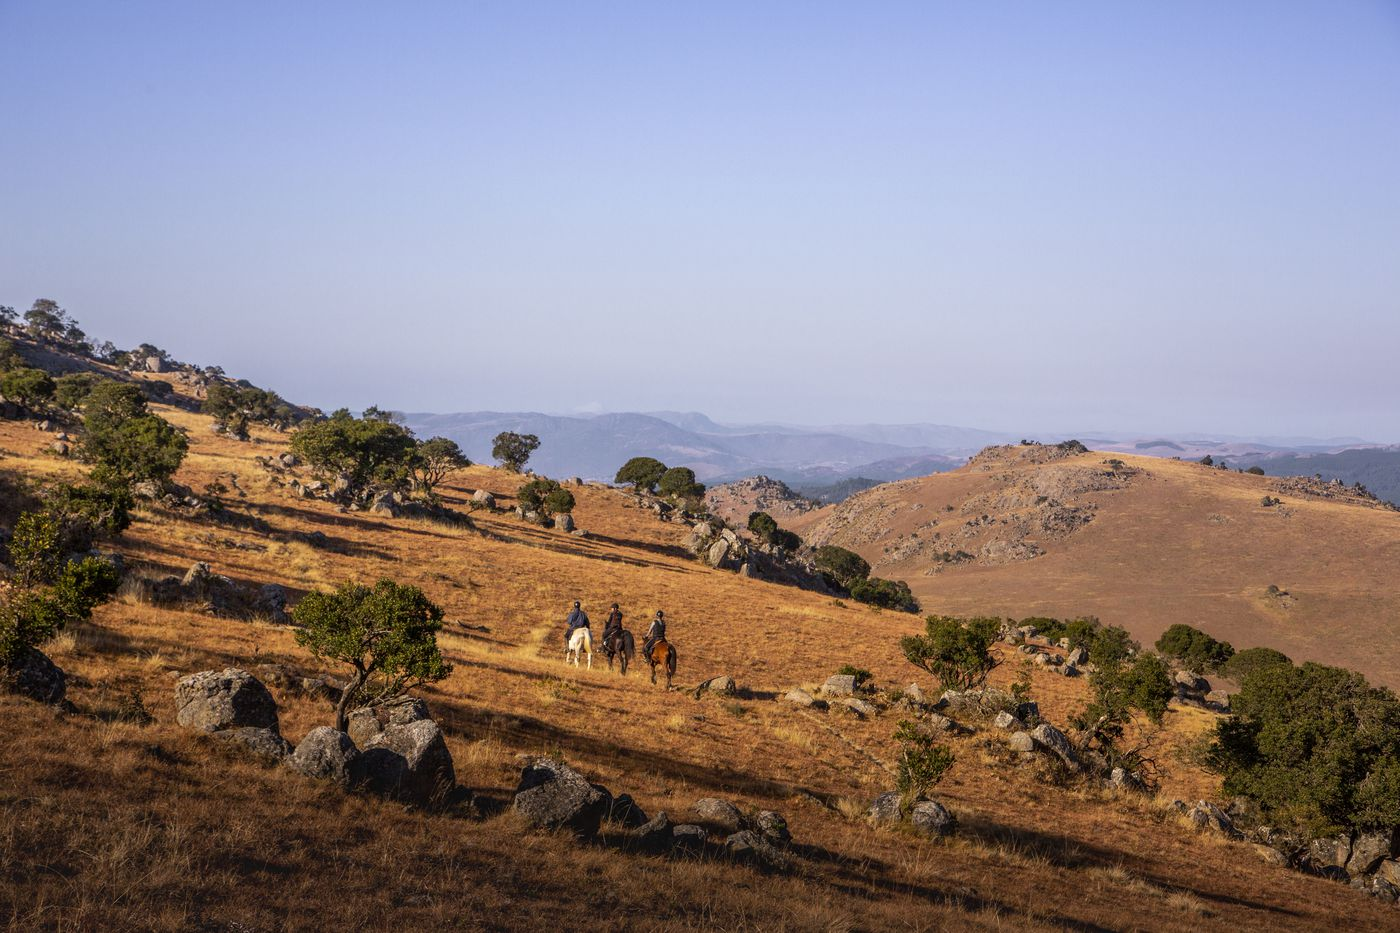 Swazi Culture & Scenery Trail itinerary.